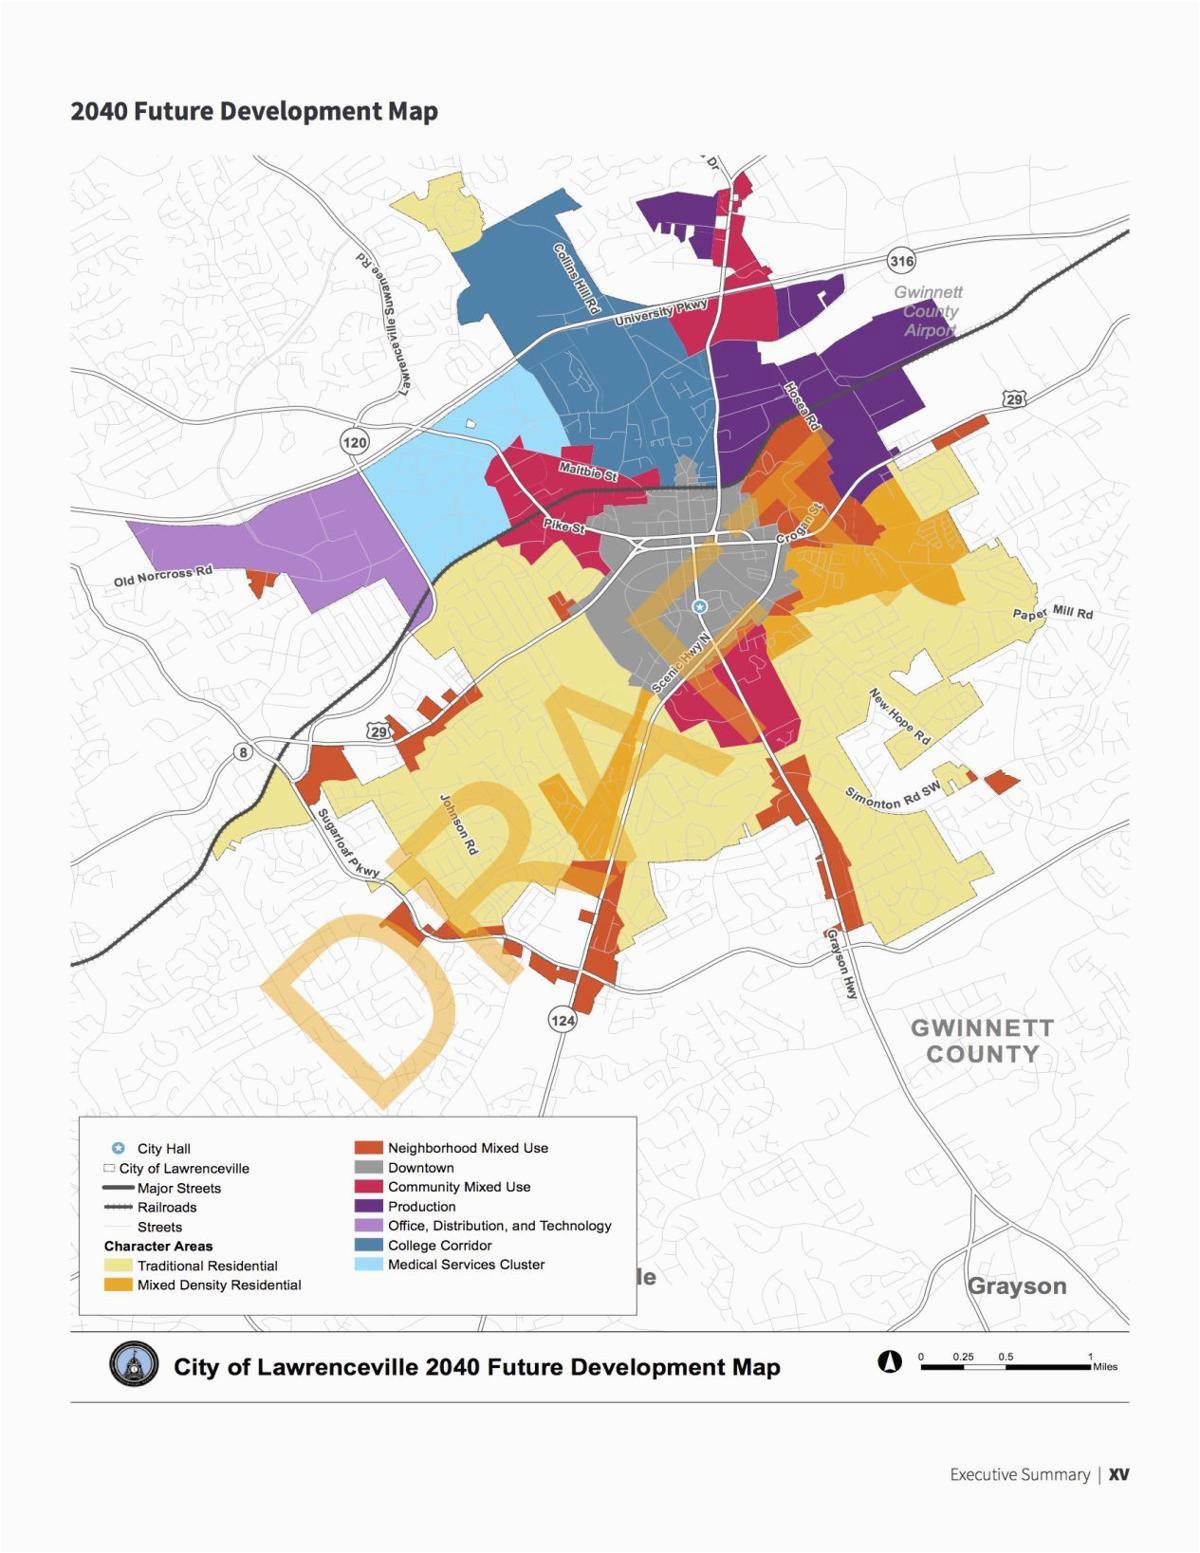 lawrenceville adopts 20 year development growth plan news